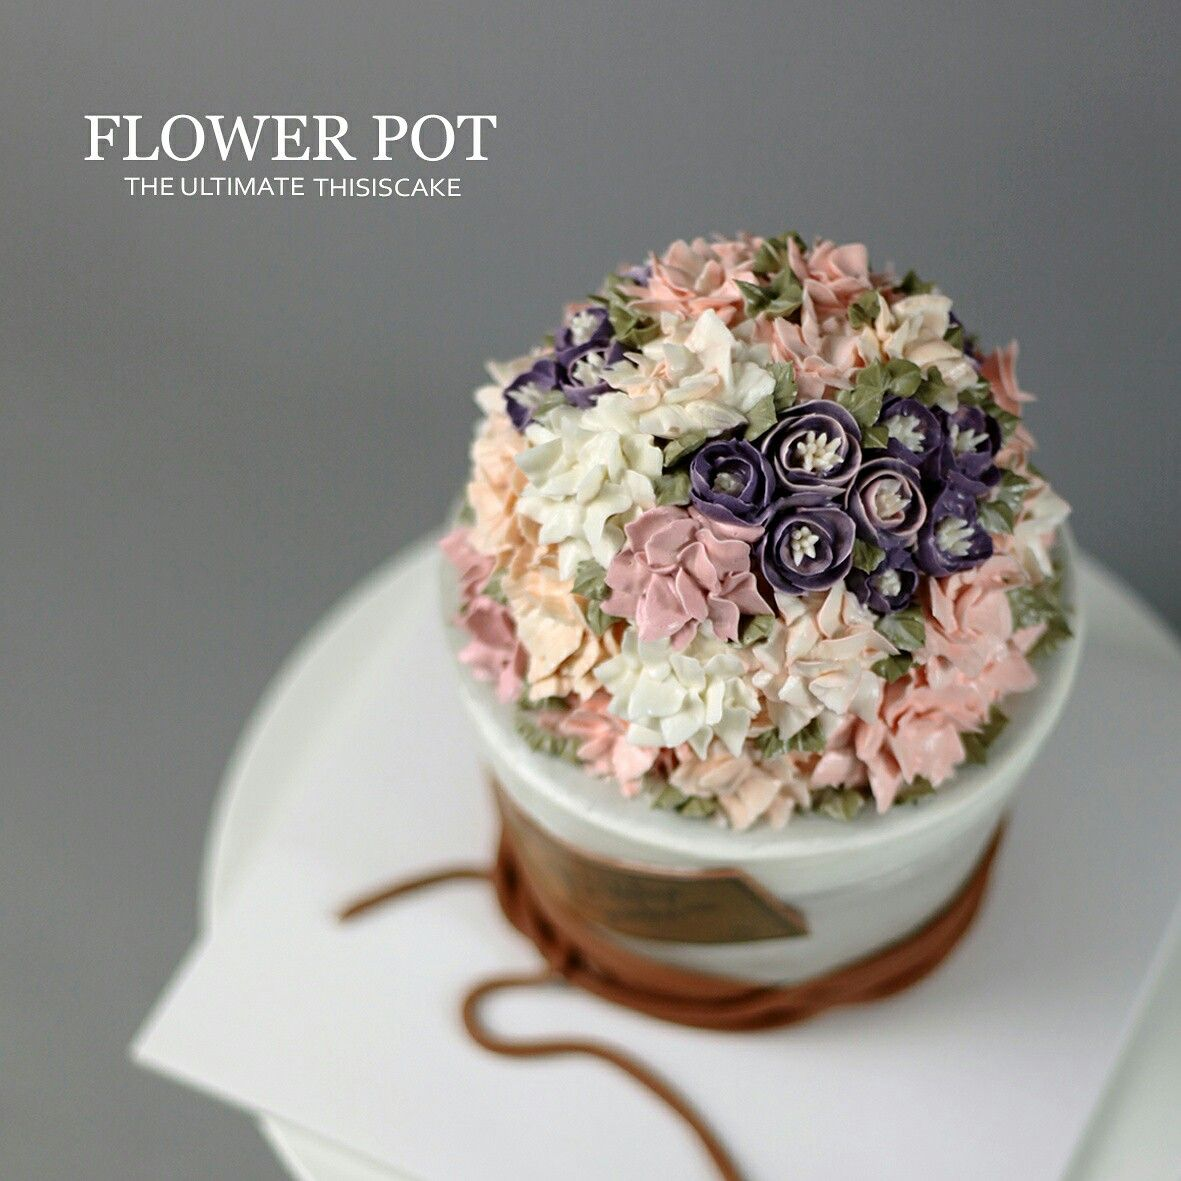 "Flower cake made with buttercream  《Class inquiry》 kakotalk : thisiscake whatsapp : 82 1051710561 http://www.thisiscake.co.kr thisiscake@naver.com  네이버 블로그를 이용해주세요~"" 검색창에 ""디스이즈케이크""  #charactercake #cakeclass #thisiscake #koreanstylecake #3dcake #cakemodeling #cakedesign #디스이즈케이크 #케릭터케이크 #3d입체케이크 #buttercreamcakes #watercolor #flowerbucket #flowercake        ."